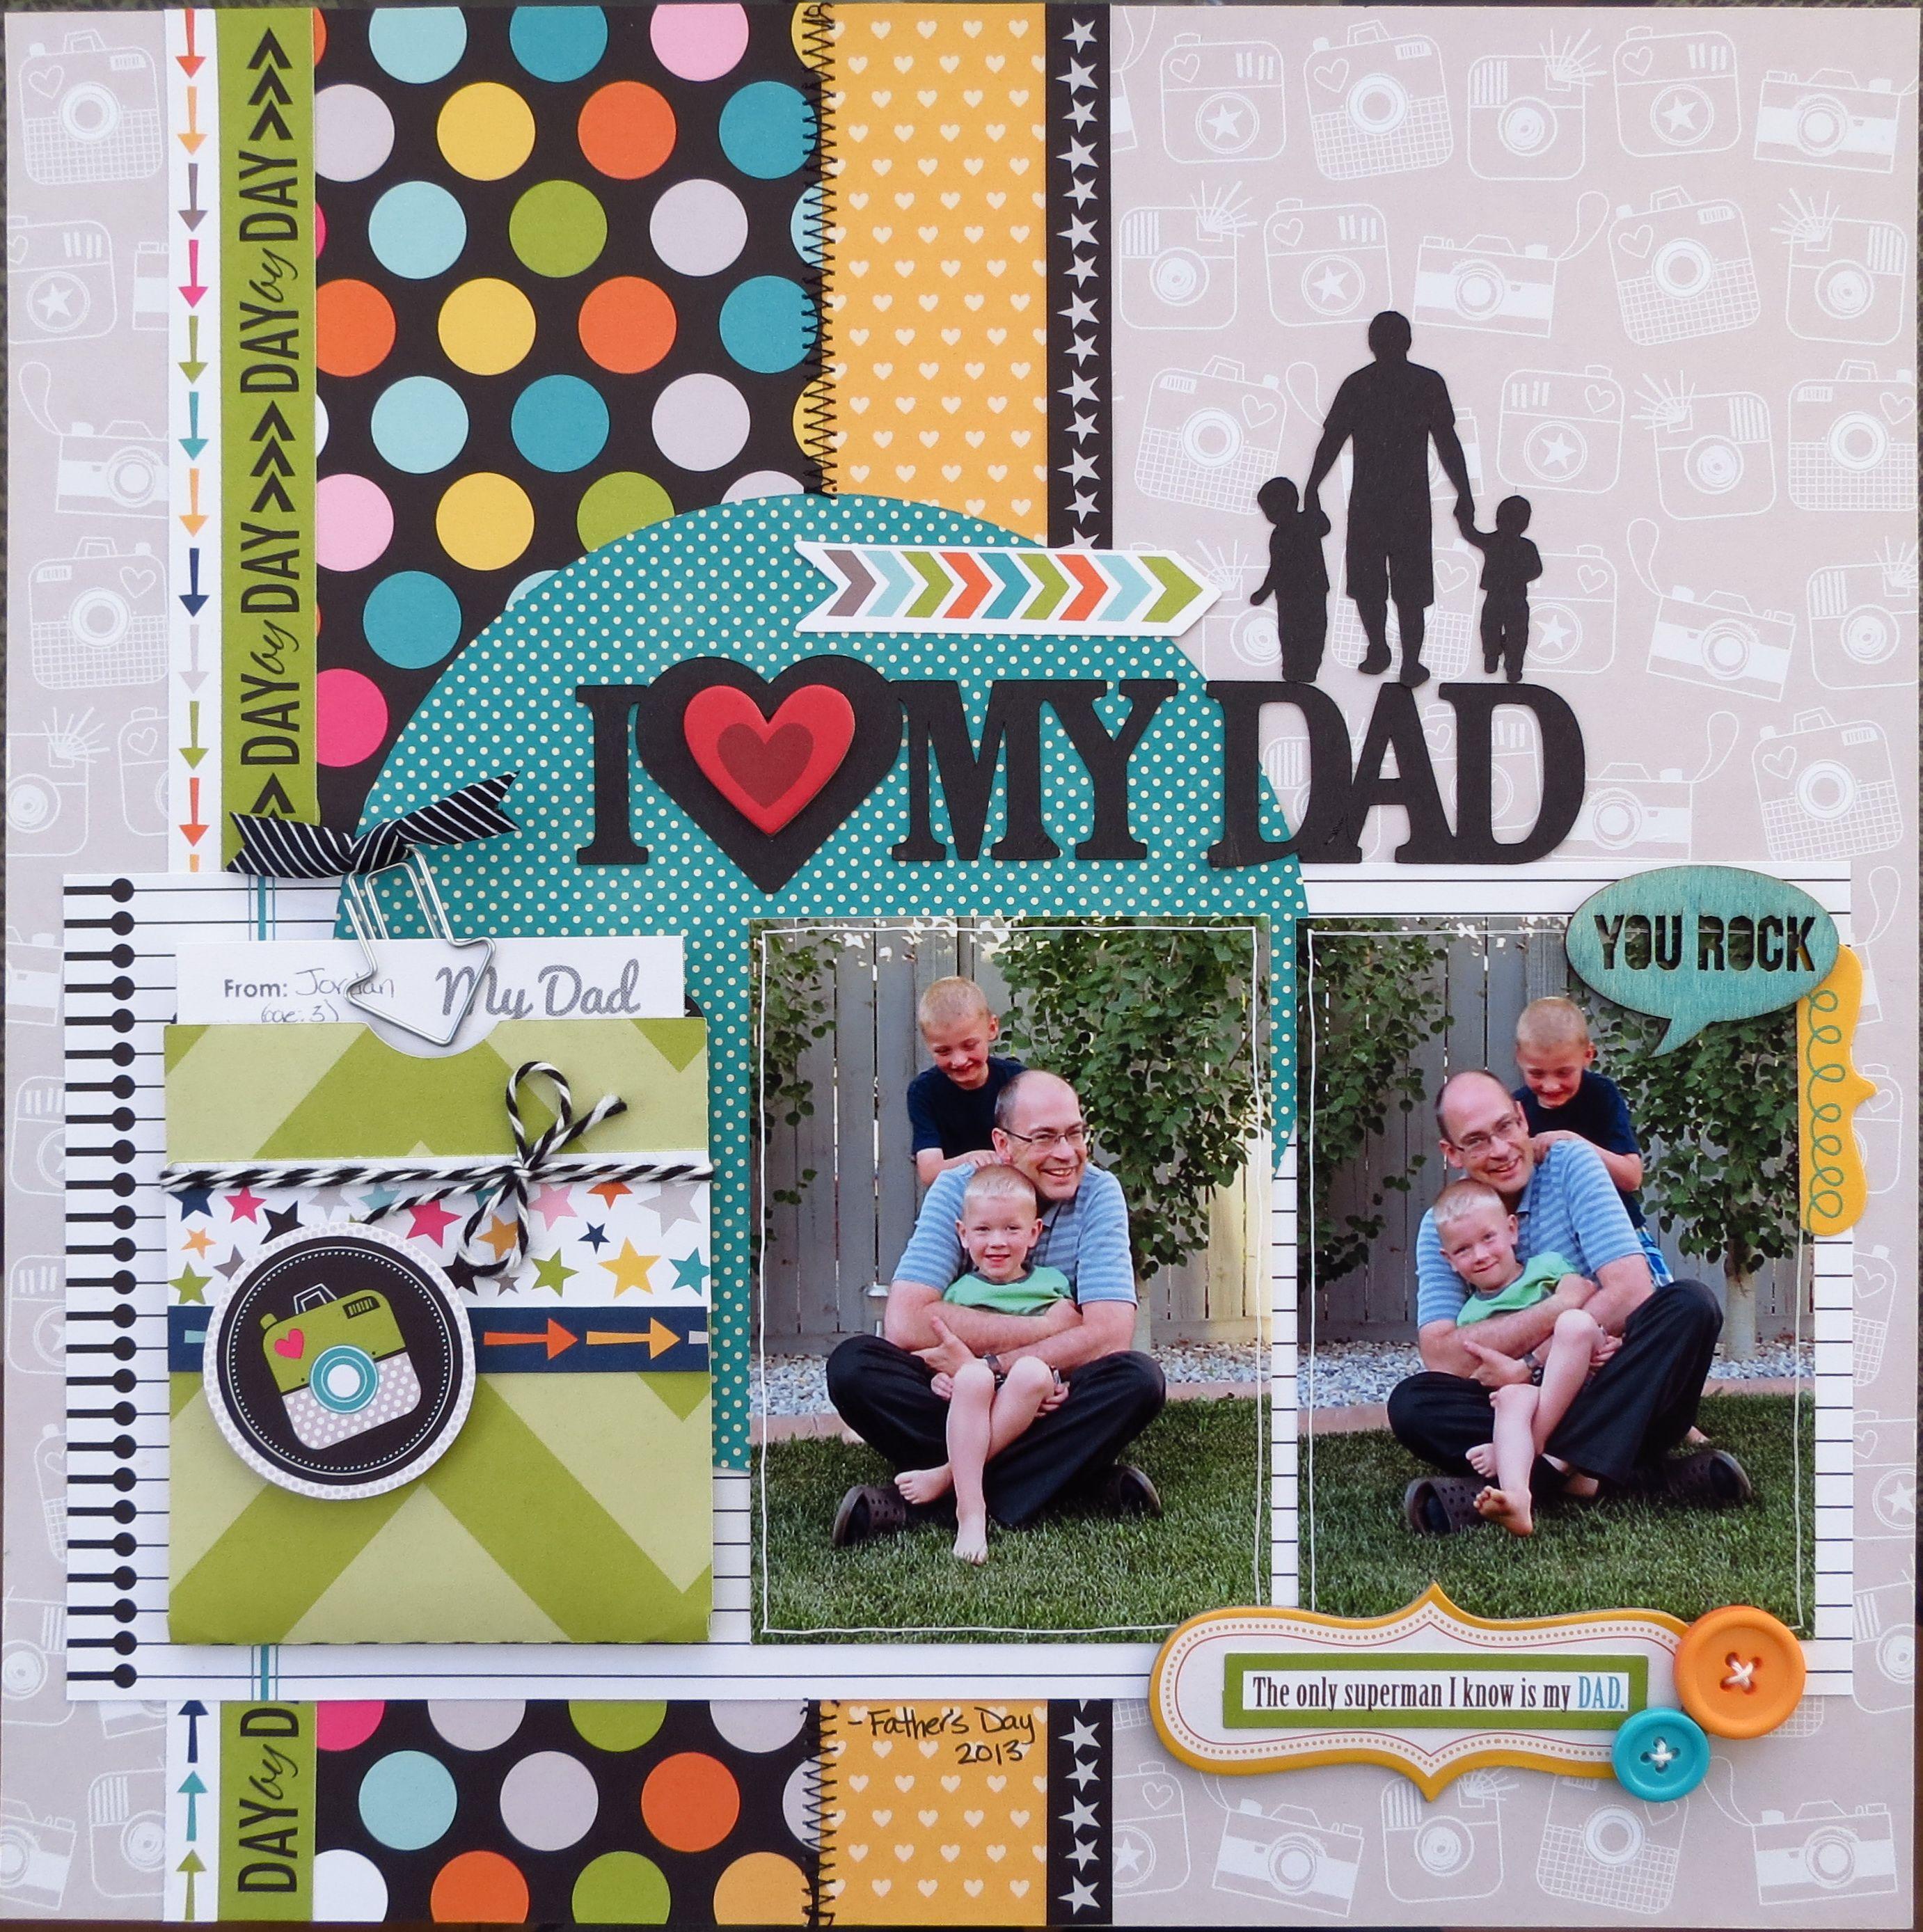 Scrapbook ideas about friends - I Heart My Dad Scrapbook Com